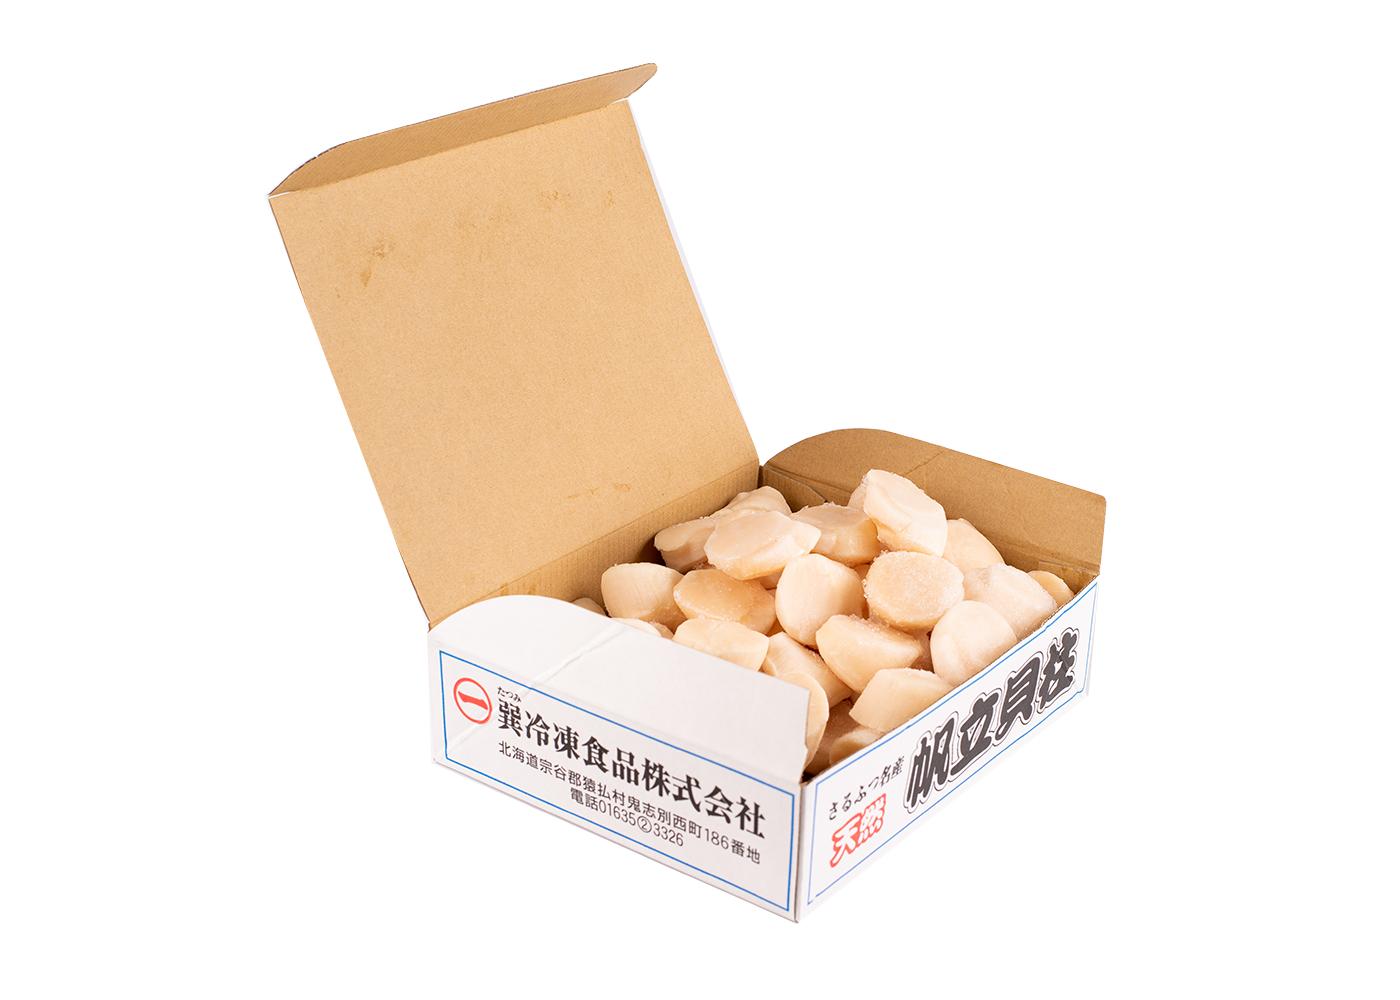 Productafbeelding JAPANSE COQUILLES TERAMOTO S4 23-27 DOOS 1KG DIEPVRIES